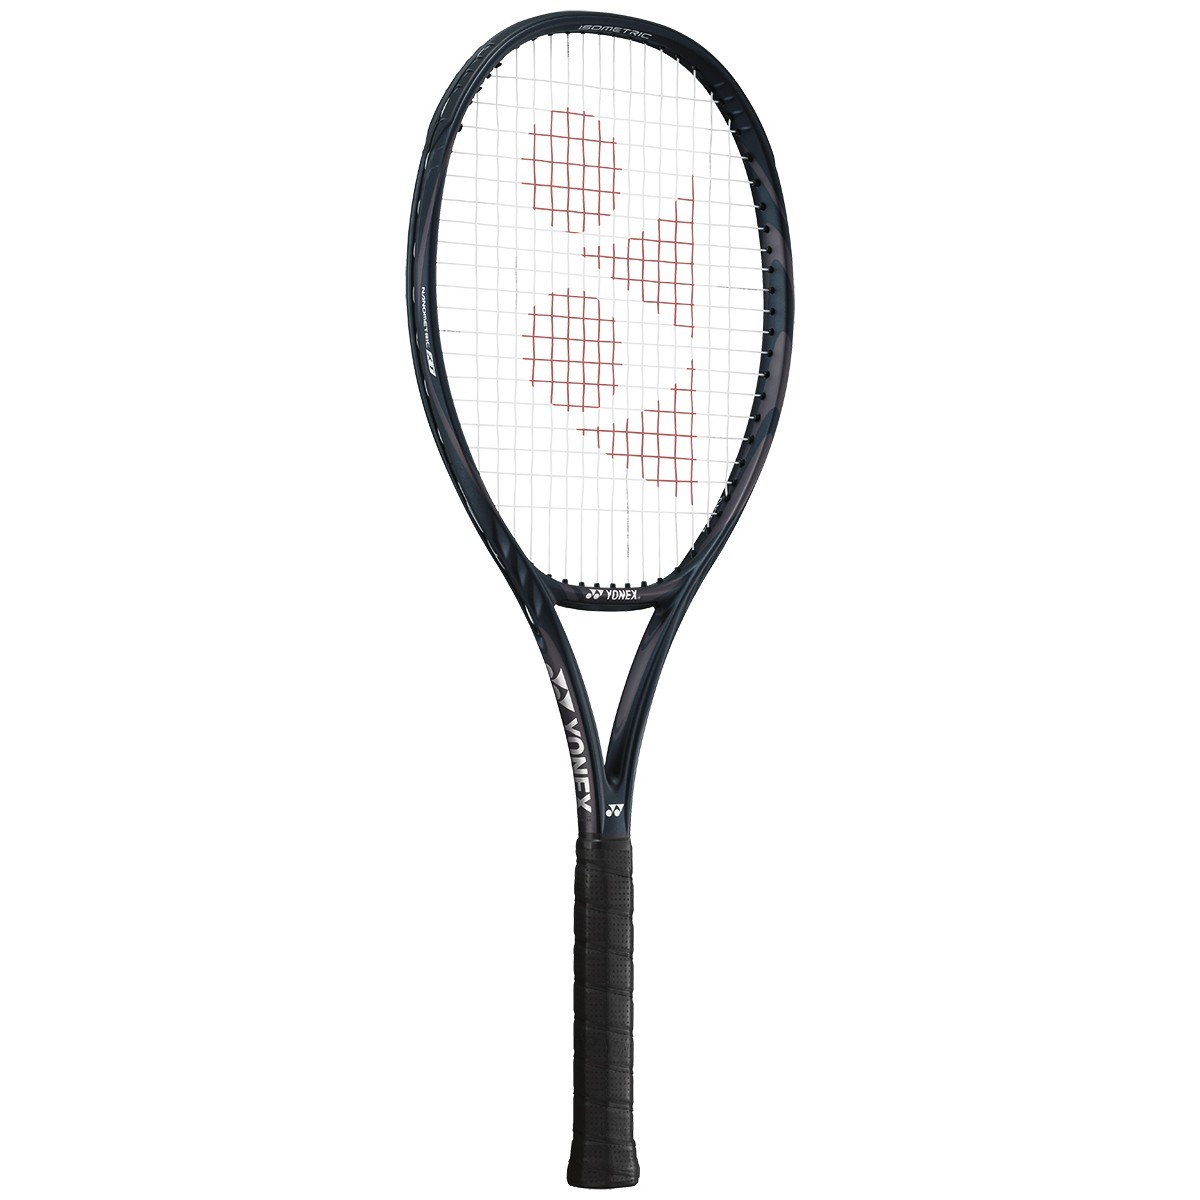 Rakieta tenisowa Yonex VCORE 100 Galaxy Black (280g) + naciąg